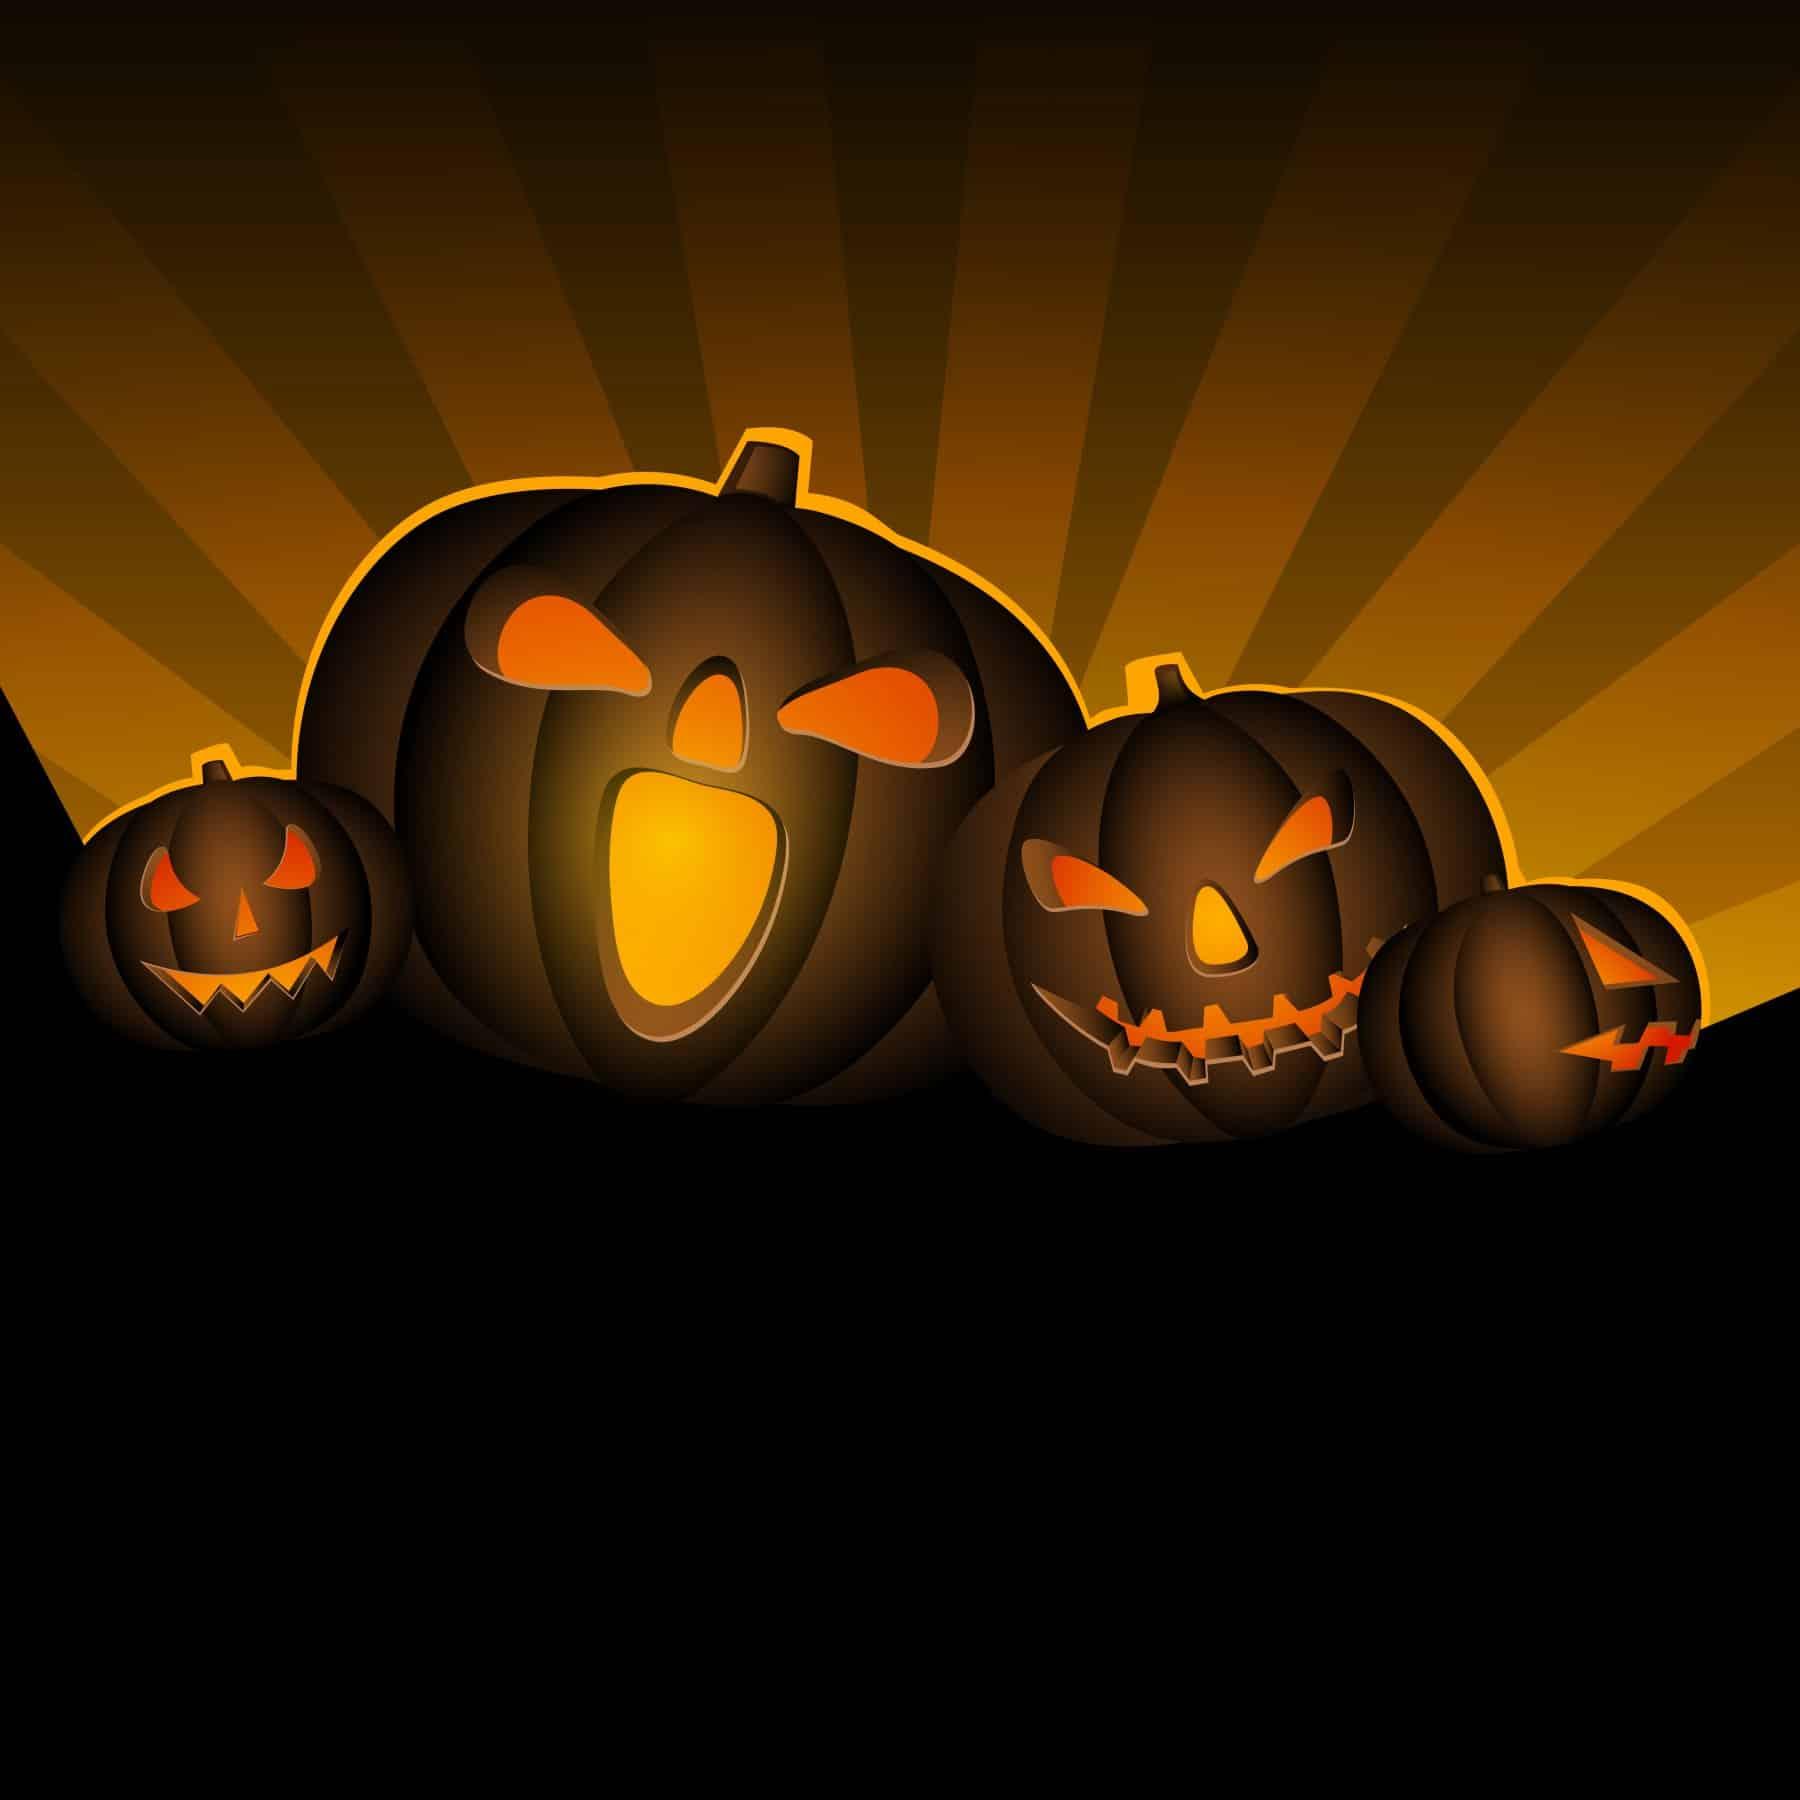 XRadio Halloween Party 2020